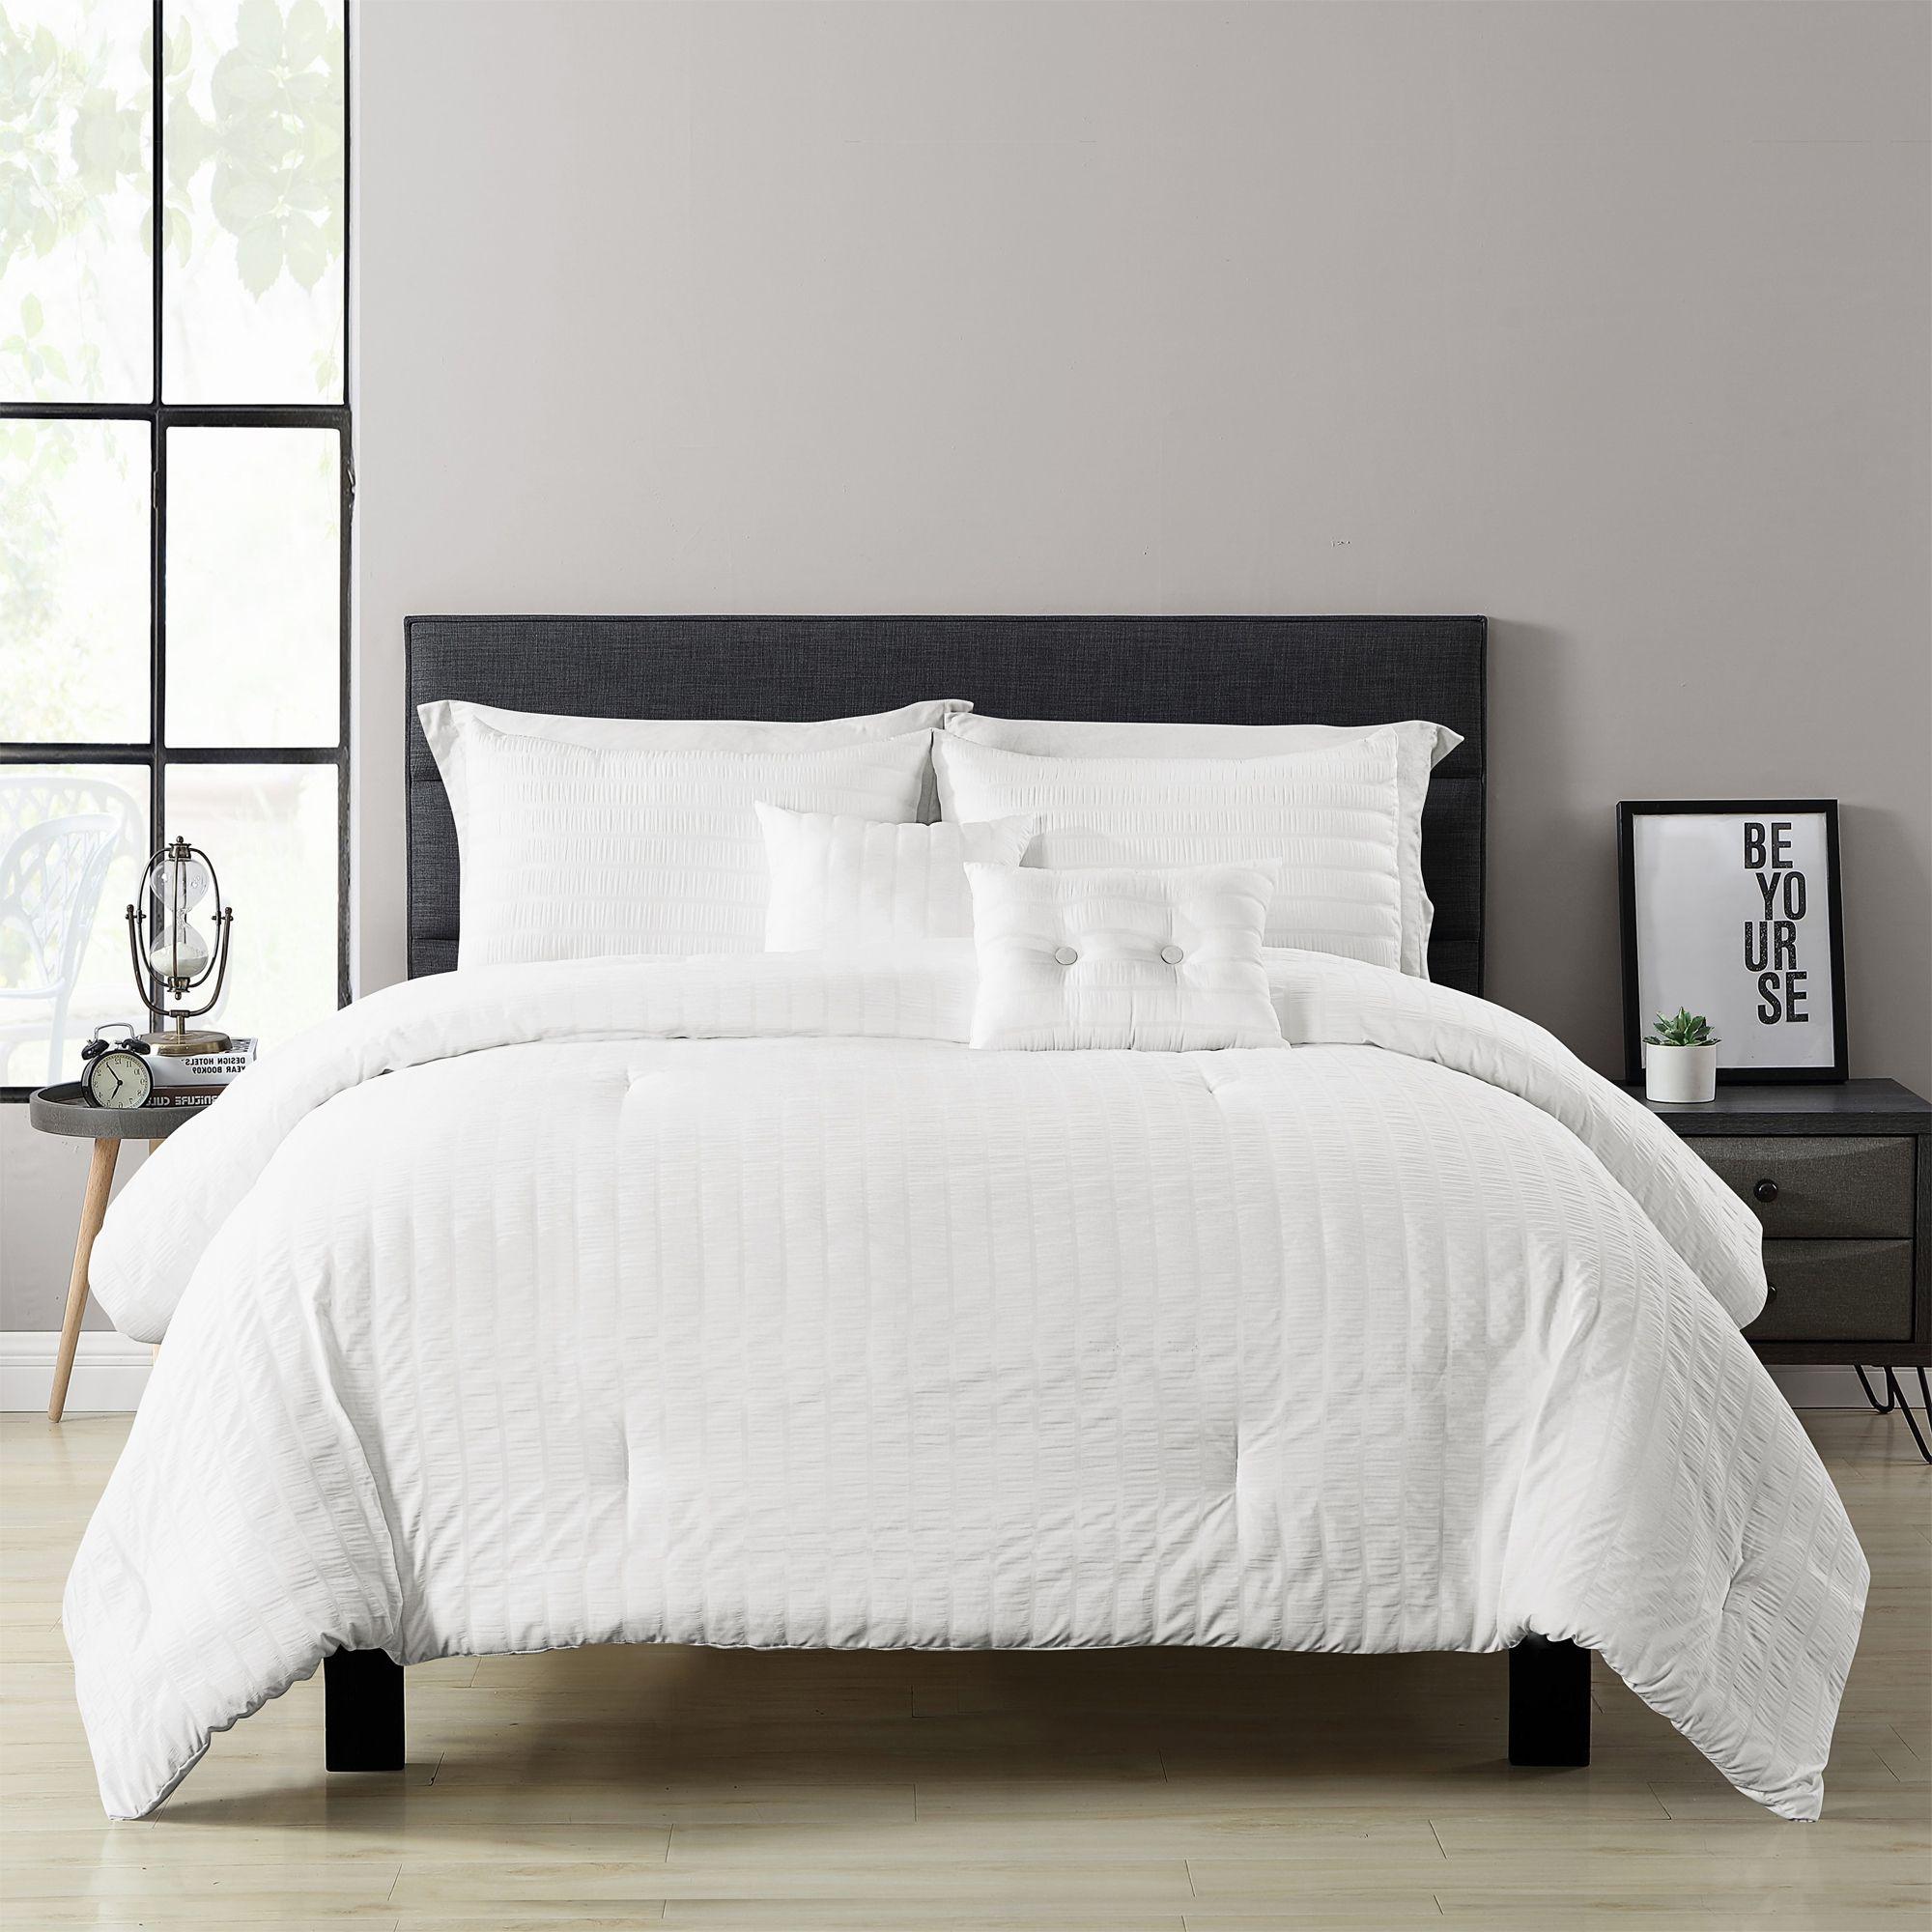 Farmhouse seersucker 5 piece comforter set comforter